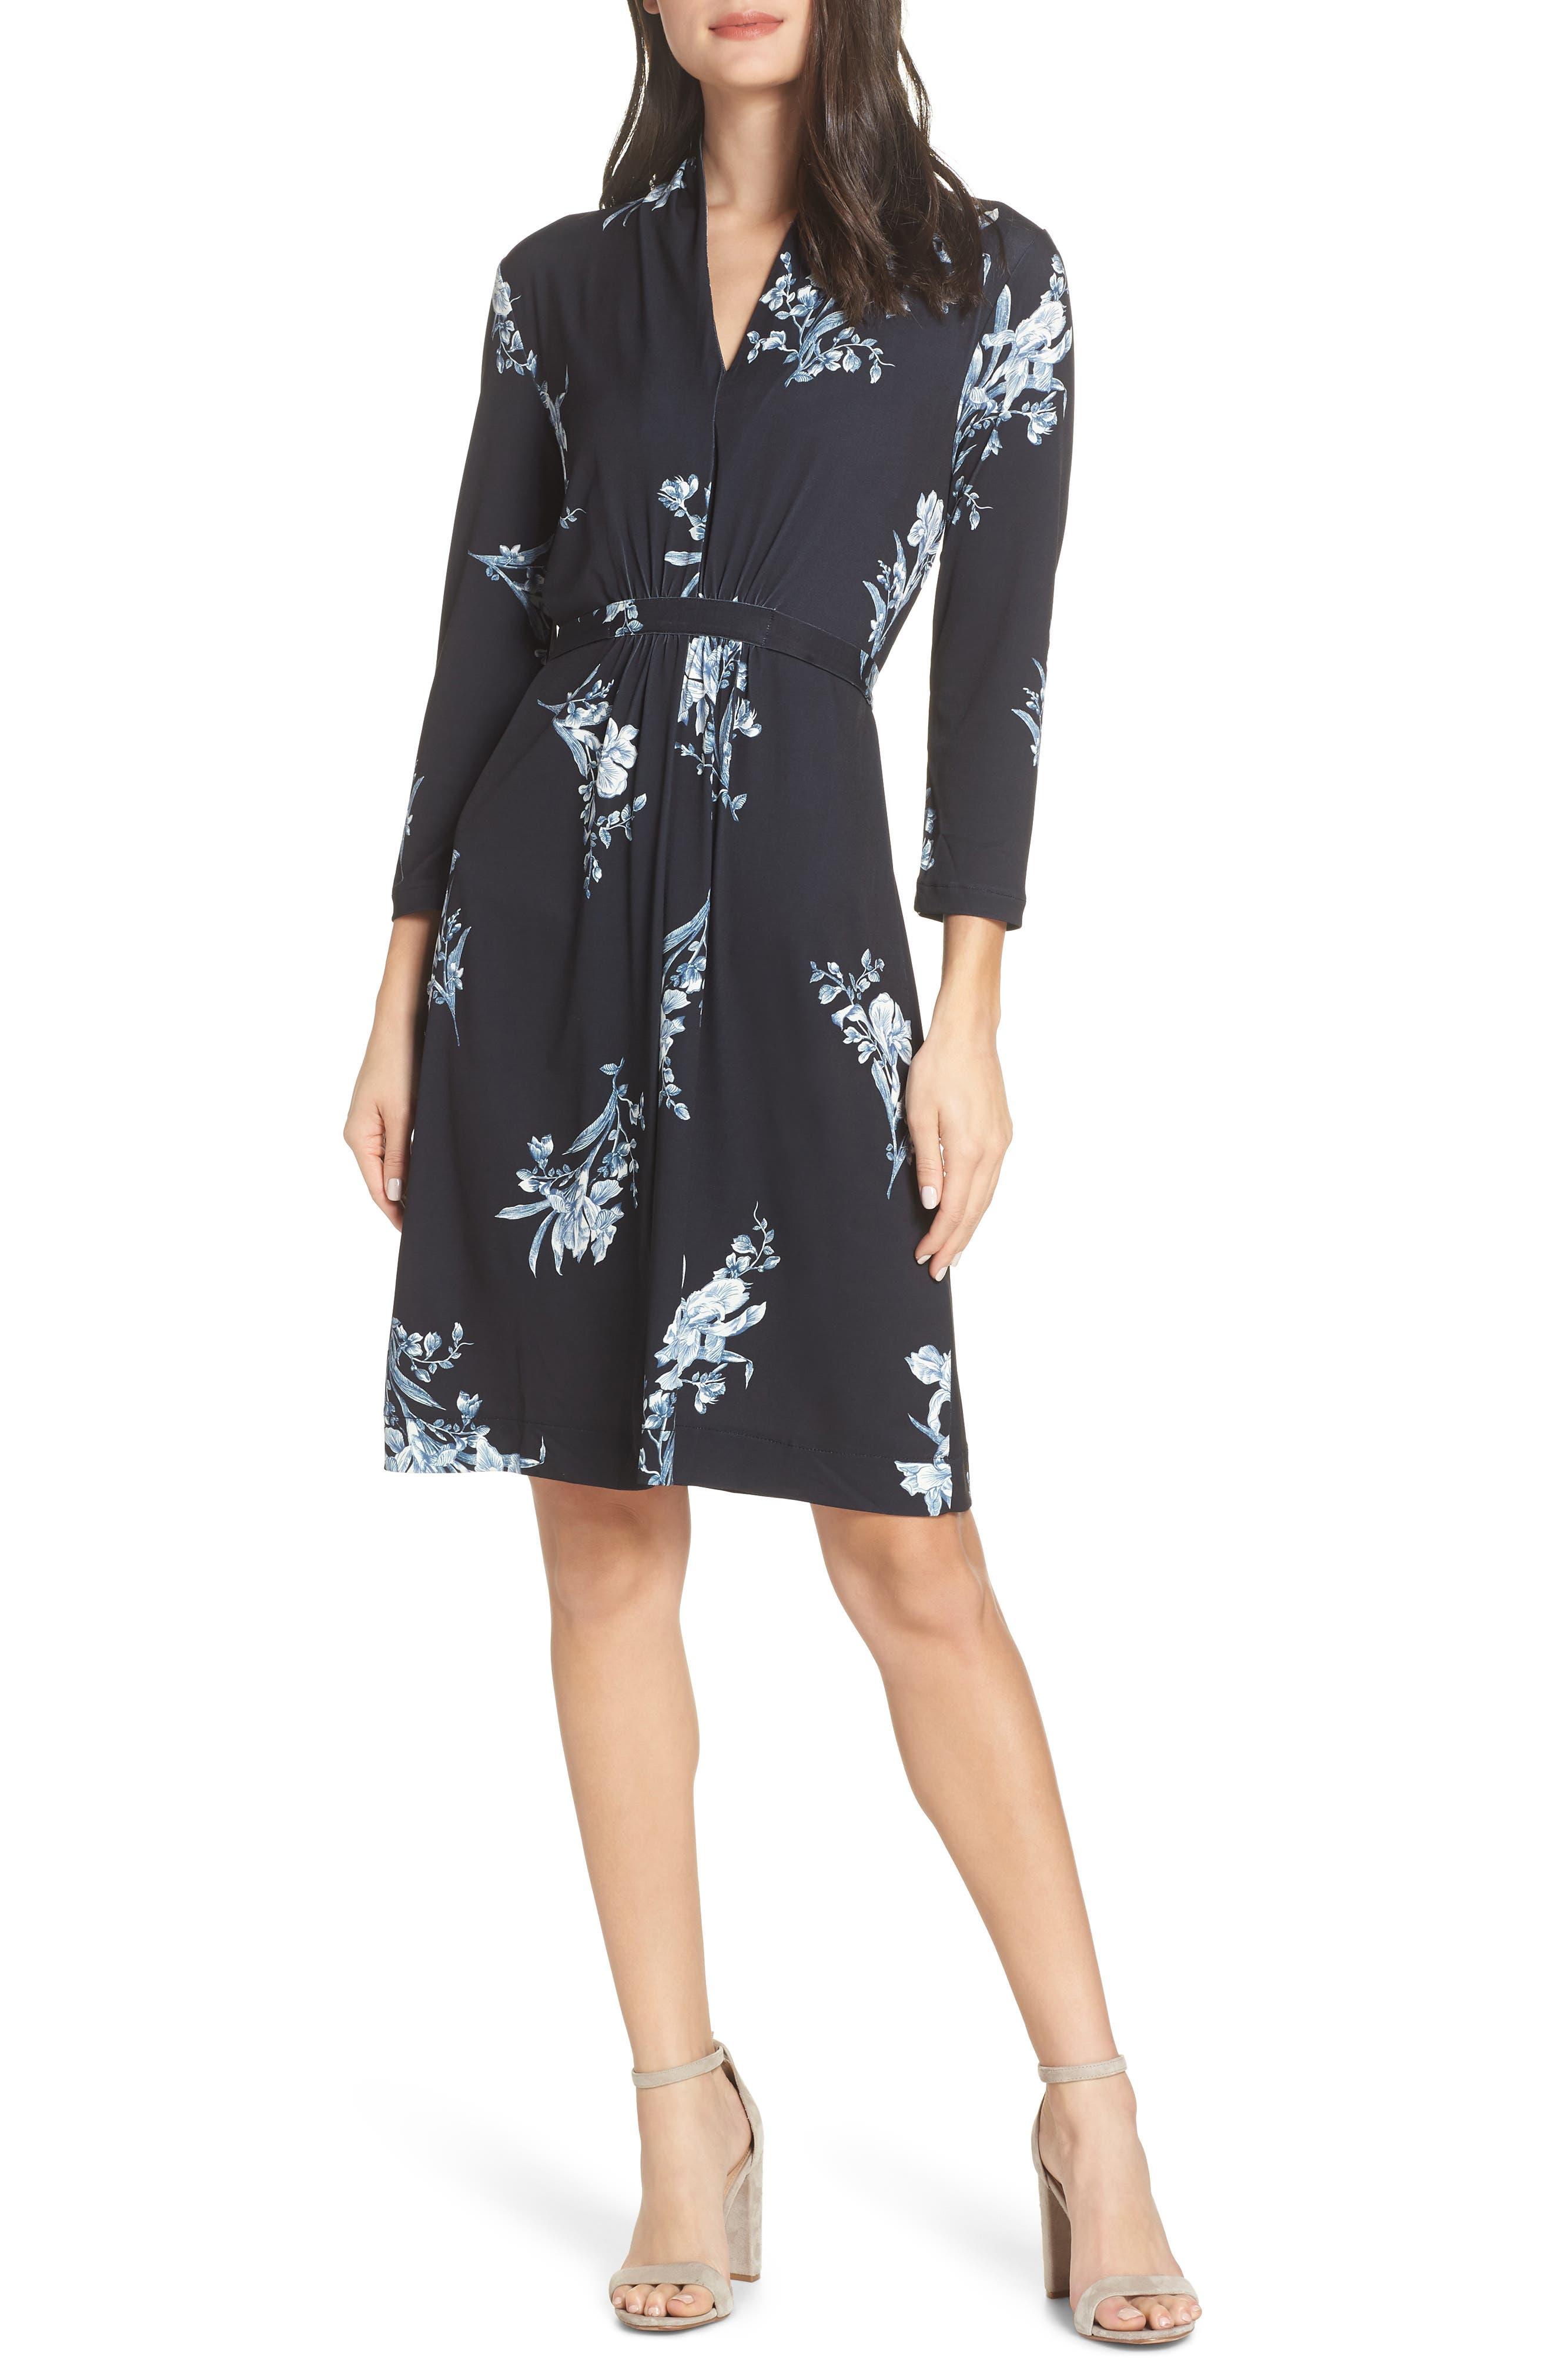 FRENCH CONNECTION, Laila Floral Print Dress, Main thumbnail 1, color, BLACK MULTI